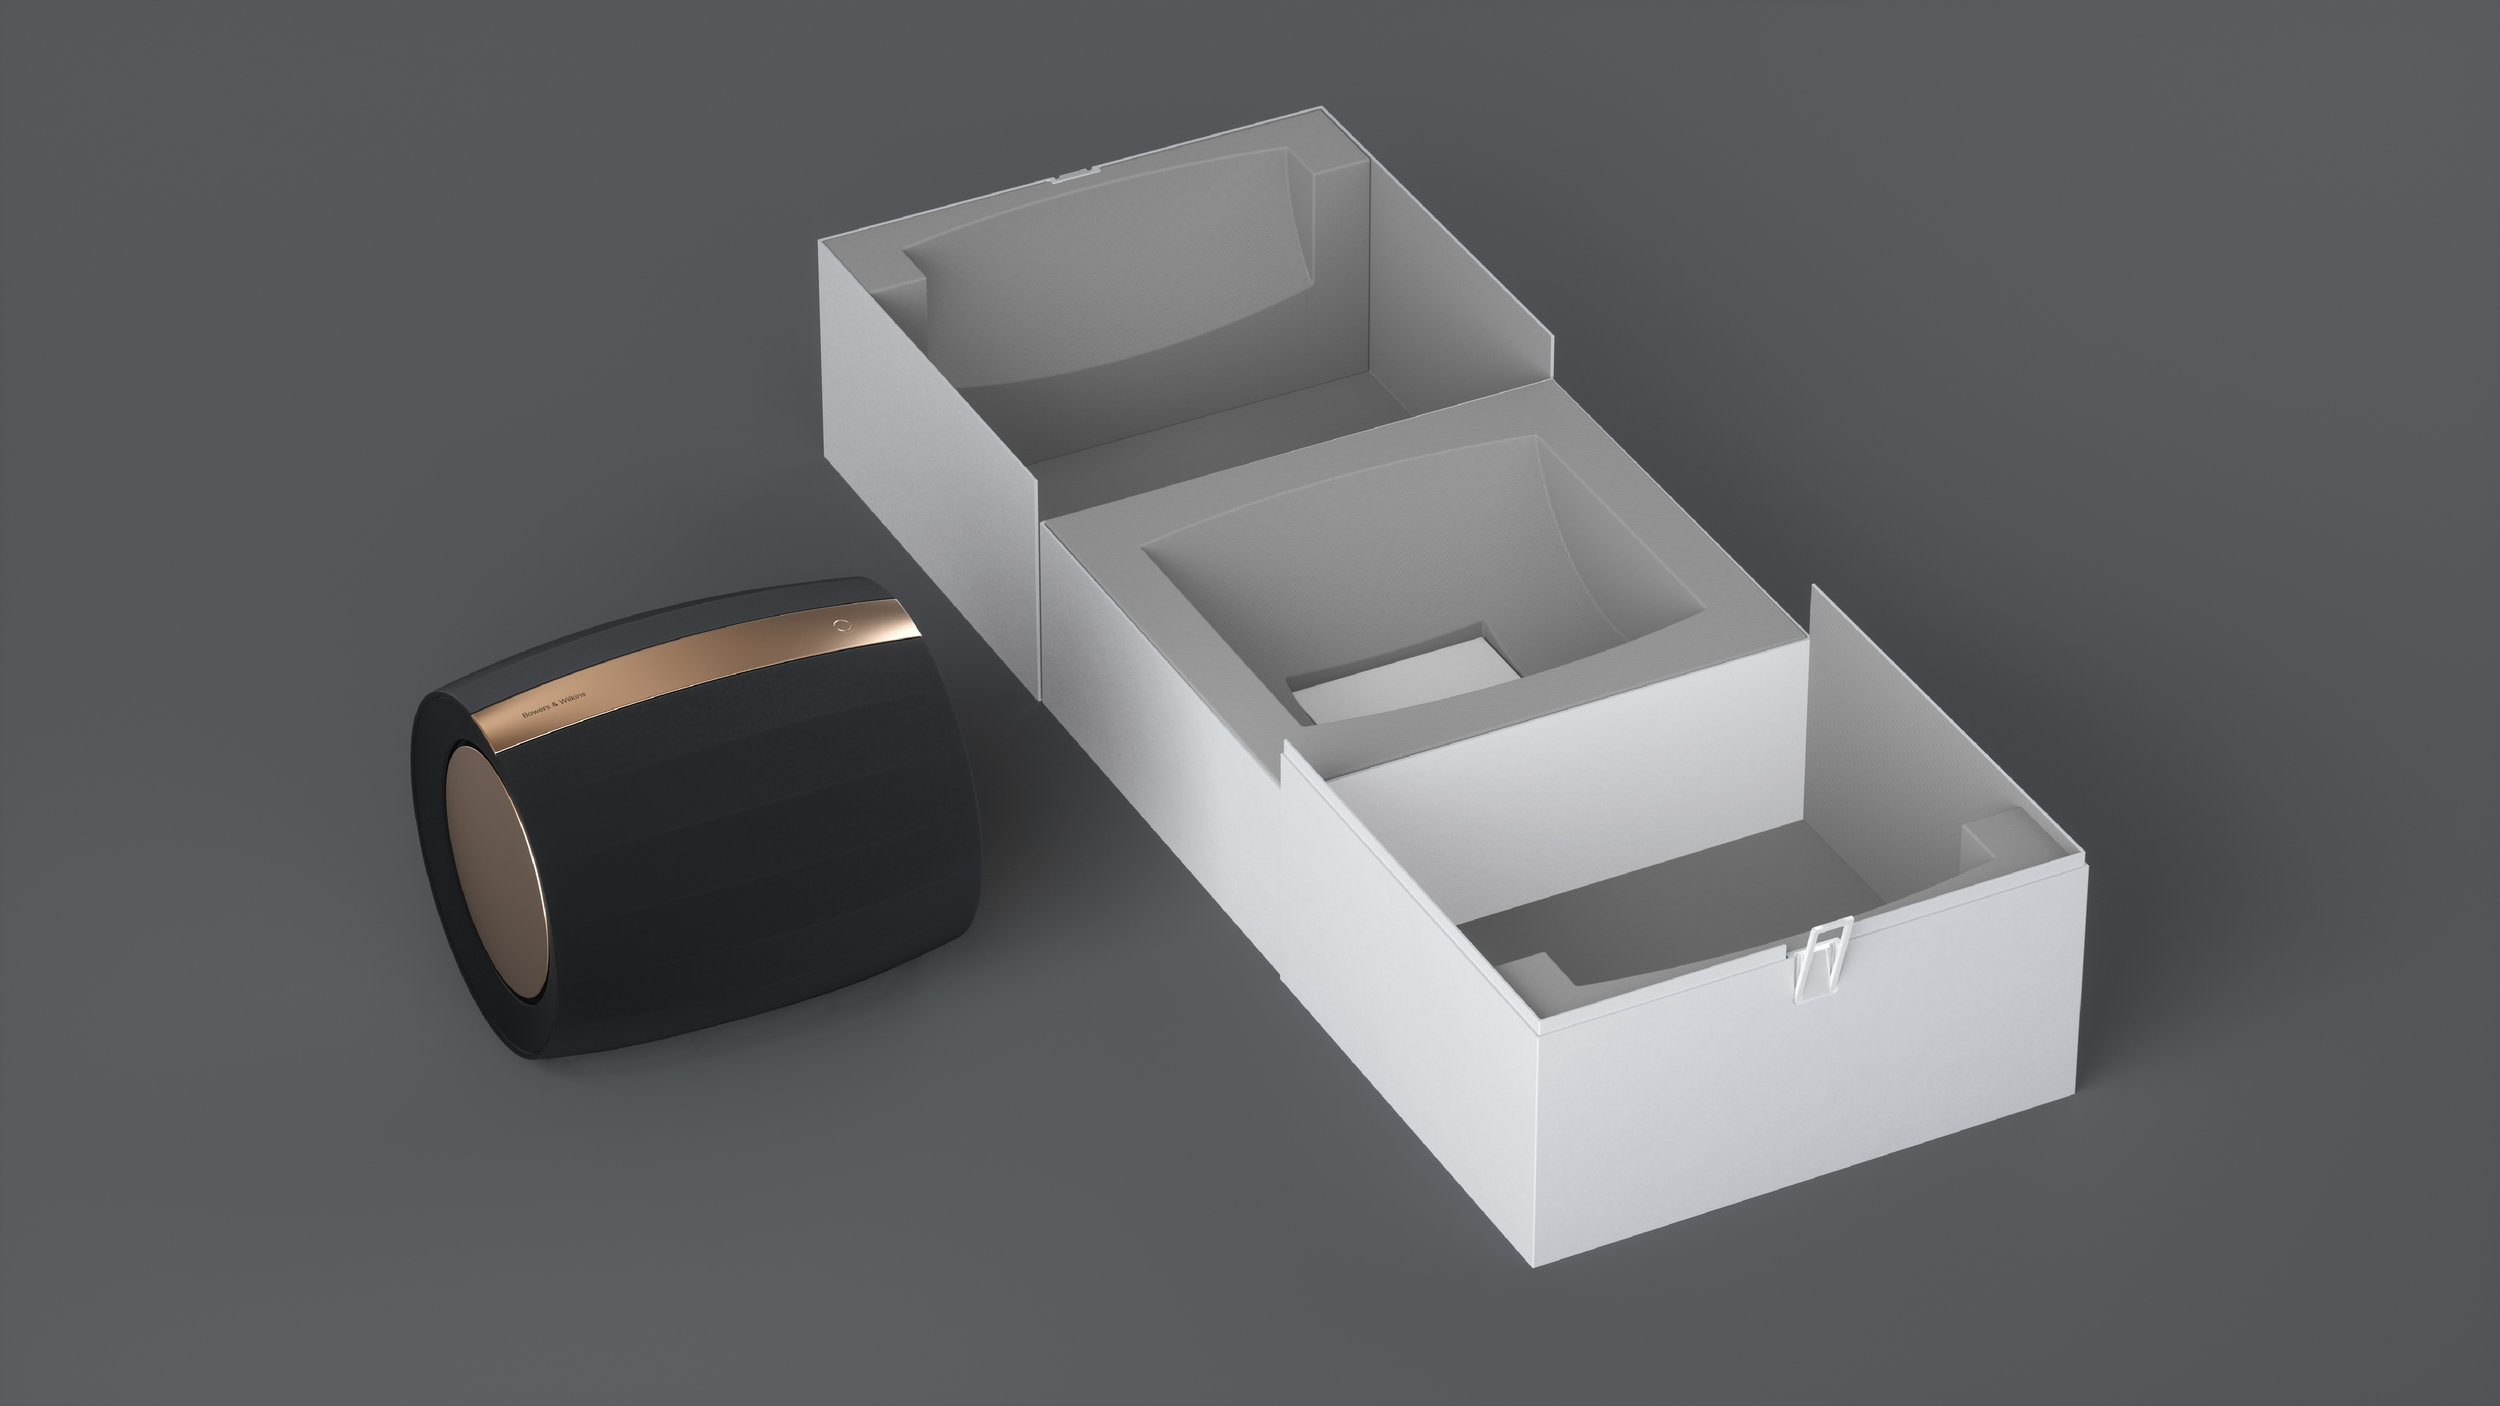 B&W_LibertySuite_PackagingStructure_R158.jpg